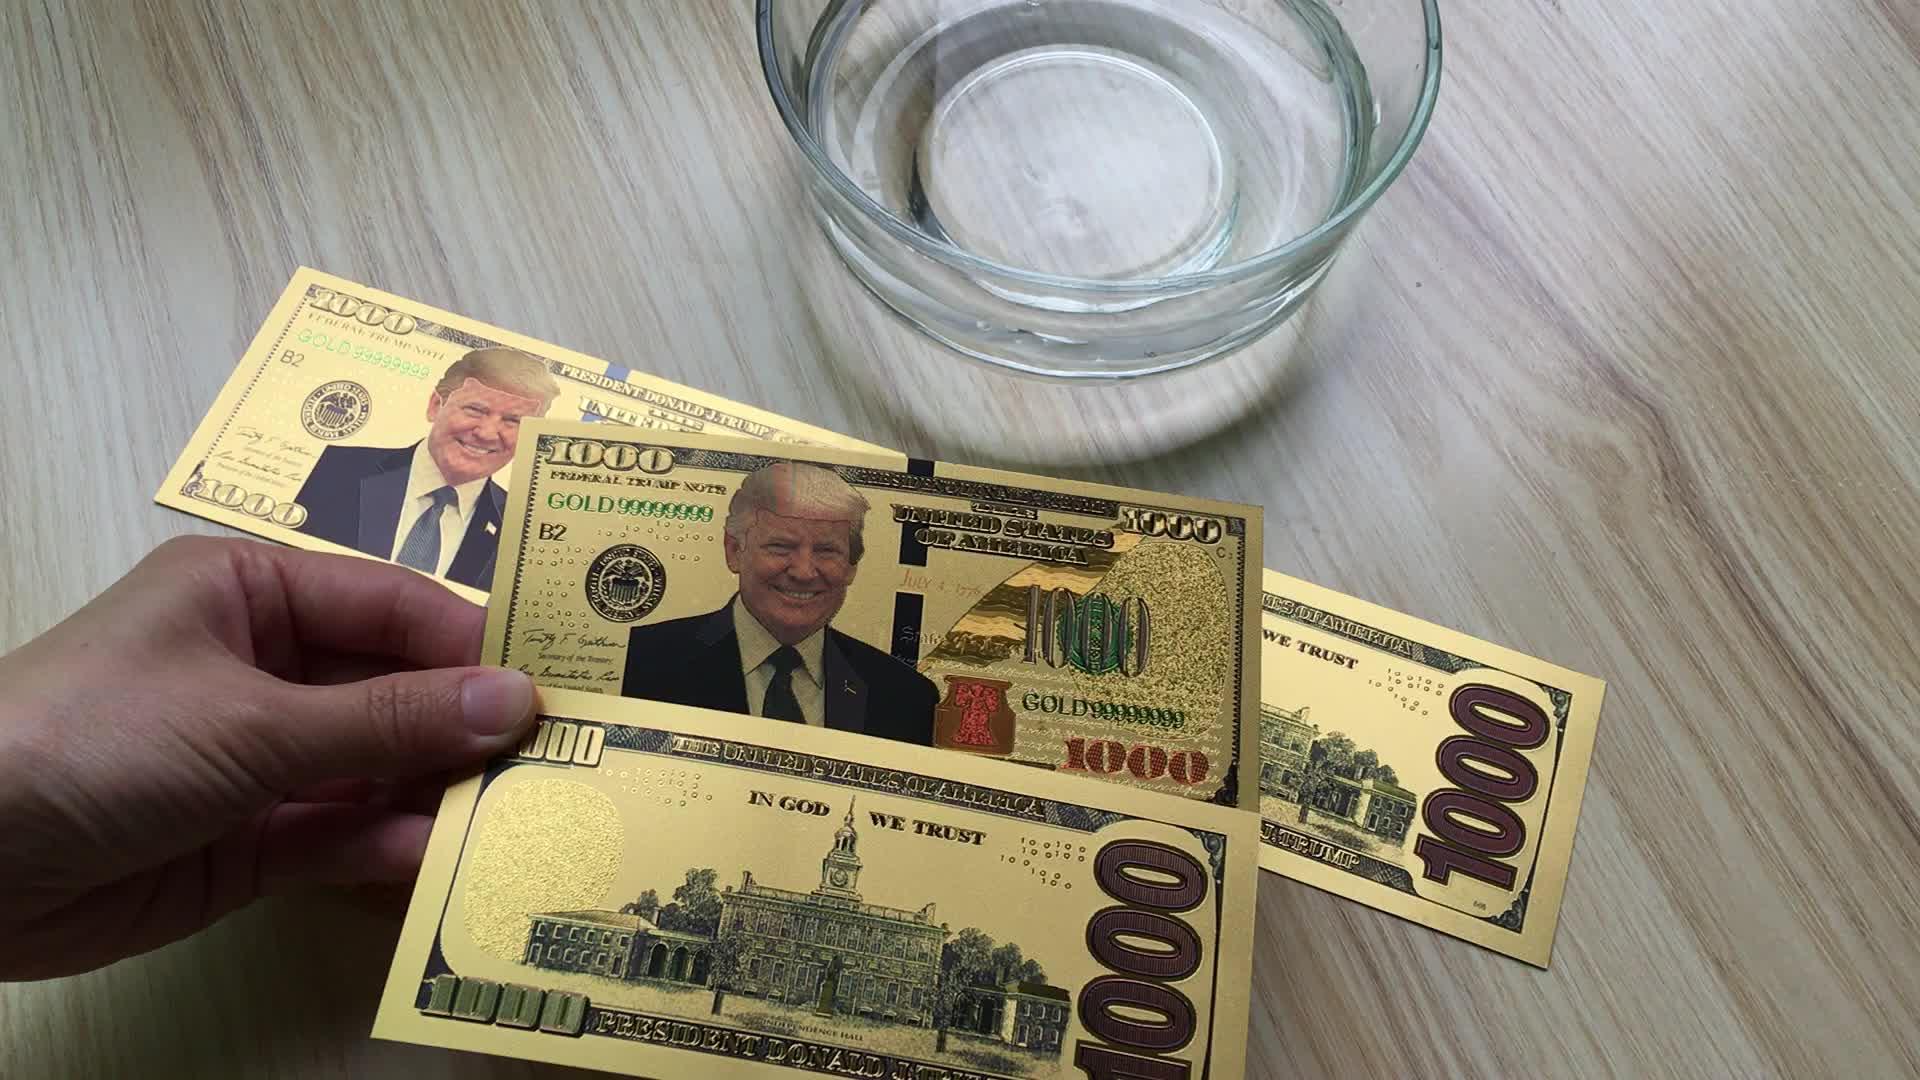 Original Size Colorized USA President Donald Trump 100 Bill Dollar Gold Foil Banknote Money